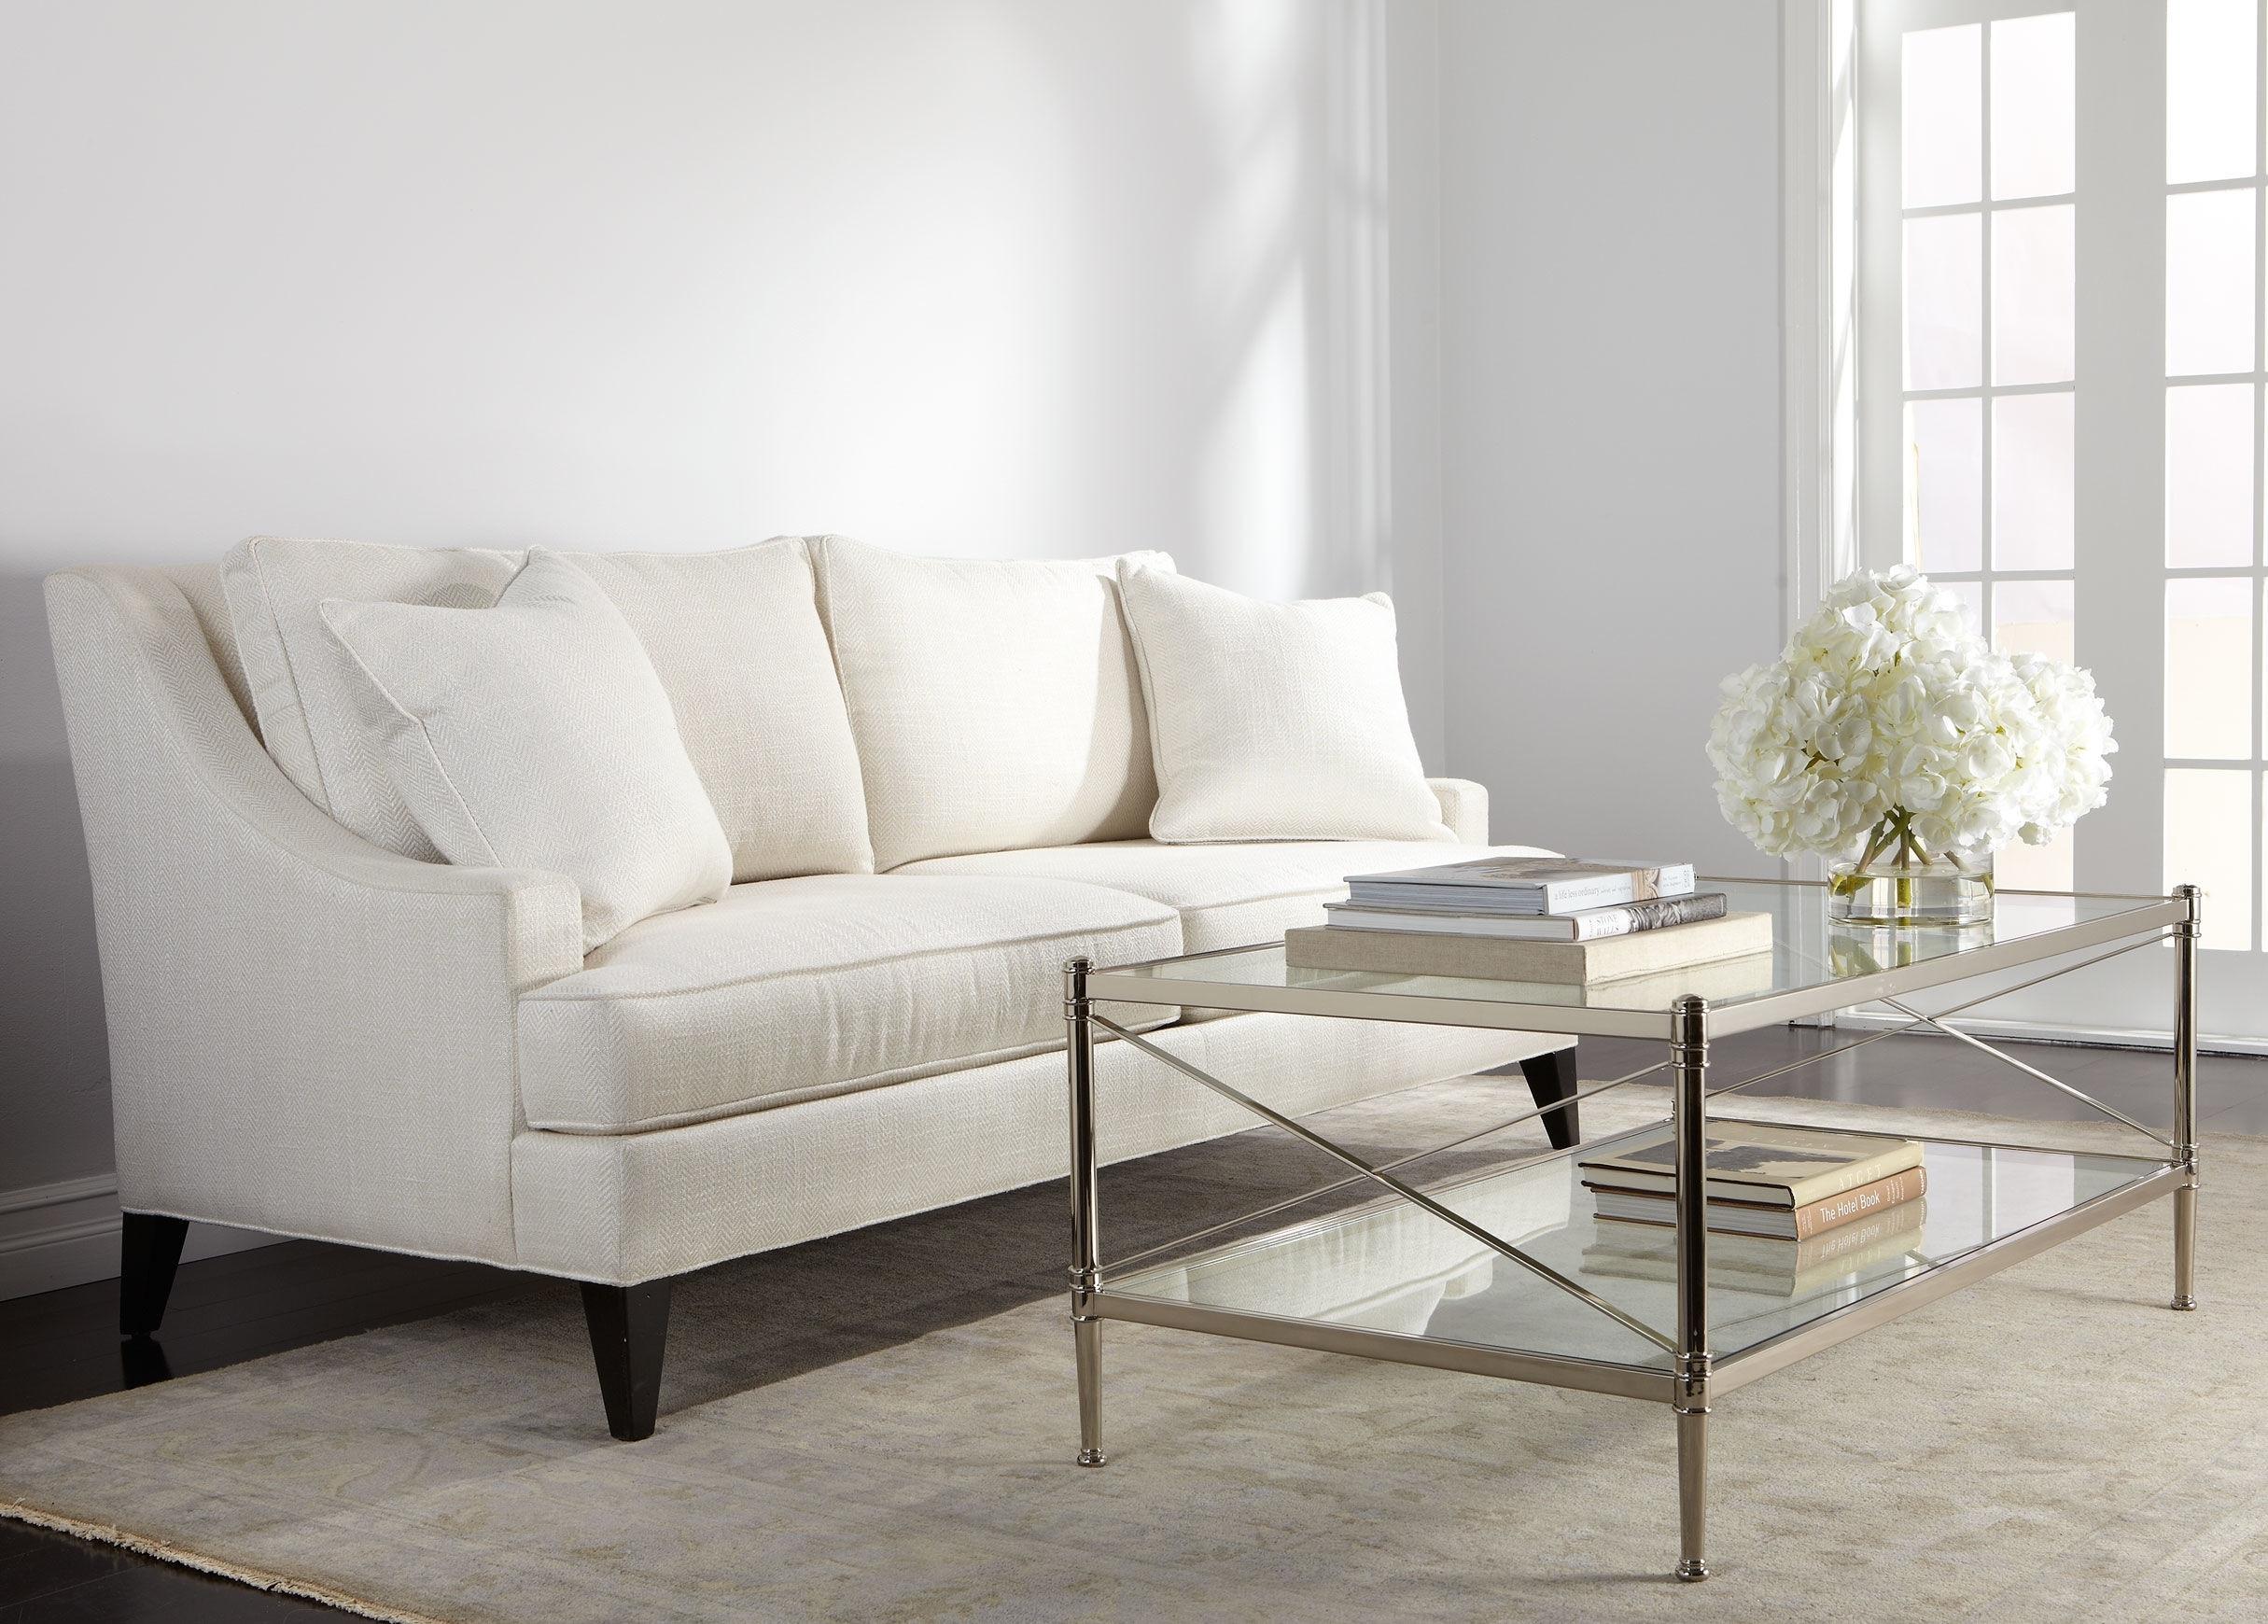 Furniture : Ethan Allen Down Filled Sofa Elegant Best Ethan Allen Inside Down Filled Sofas (View 4 of 10)